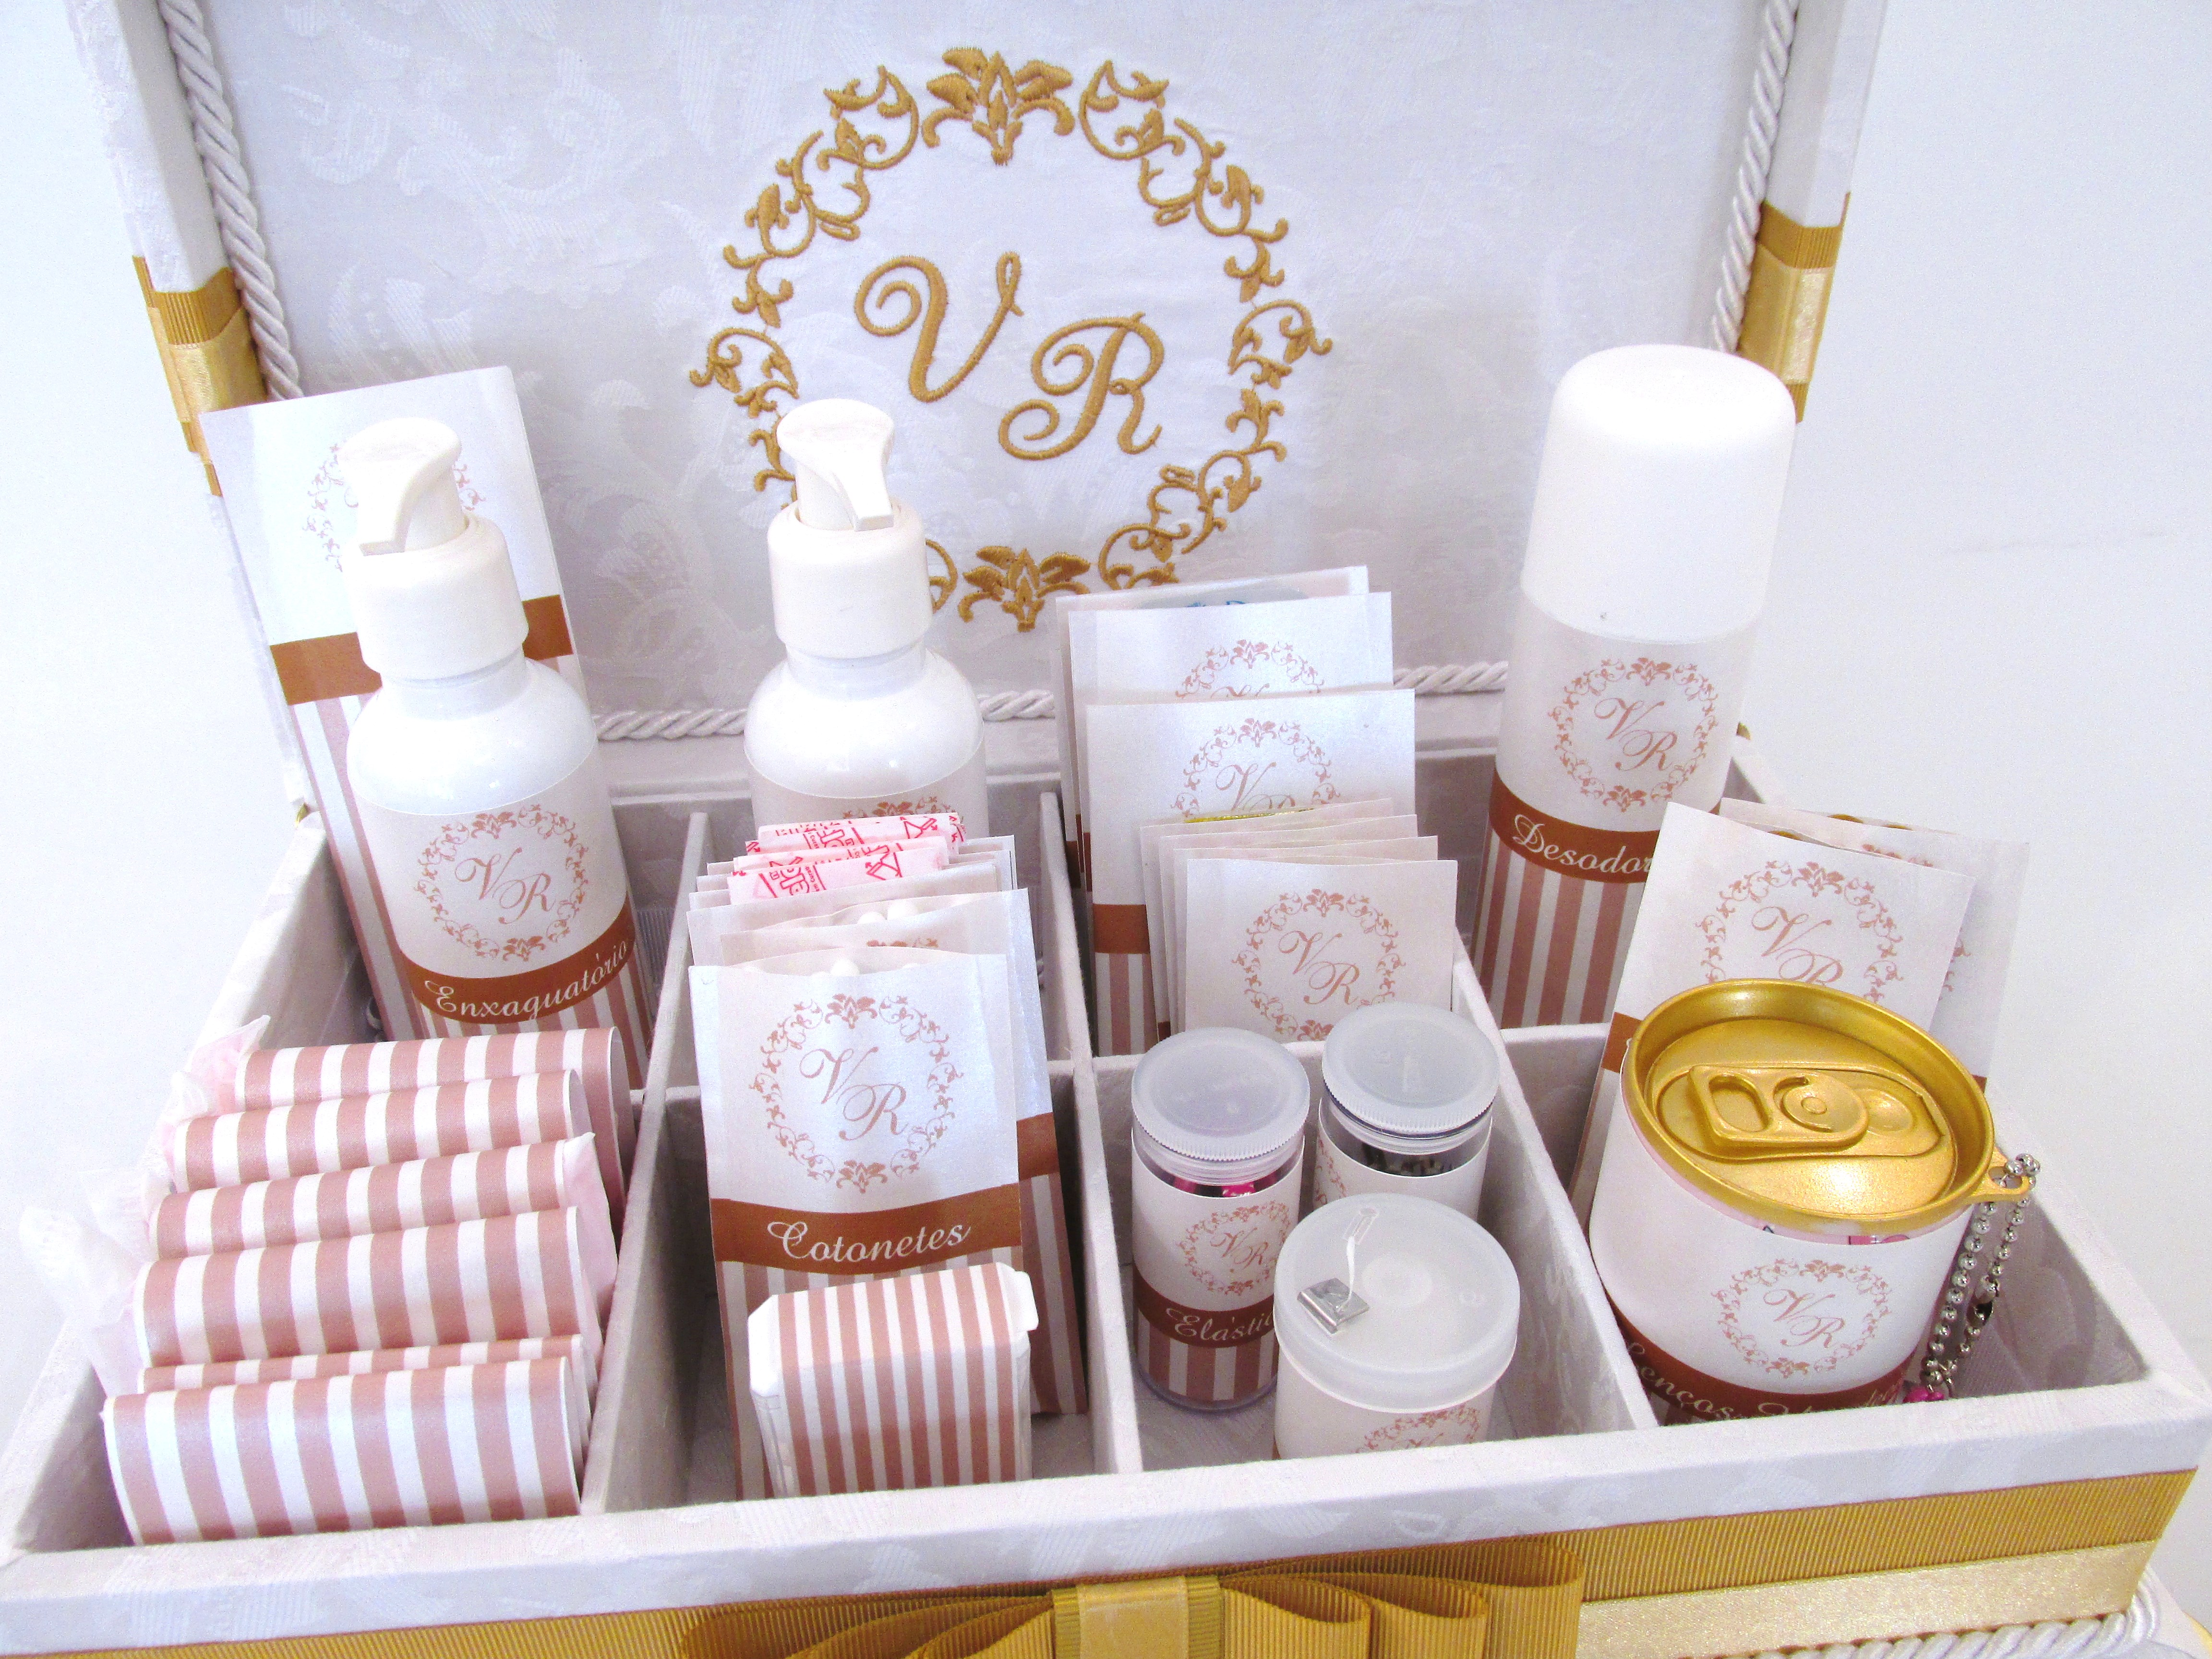 Imagens de #986B31 1000  images about Kits e lembranças on Pinterest 4608x3456 px 2854 Box Banheiro Kit